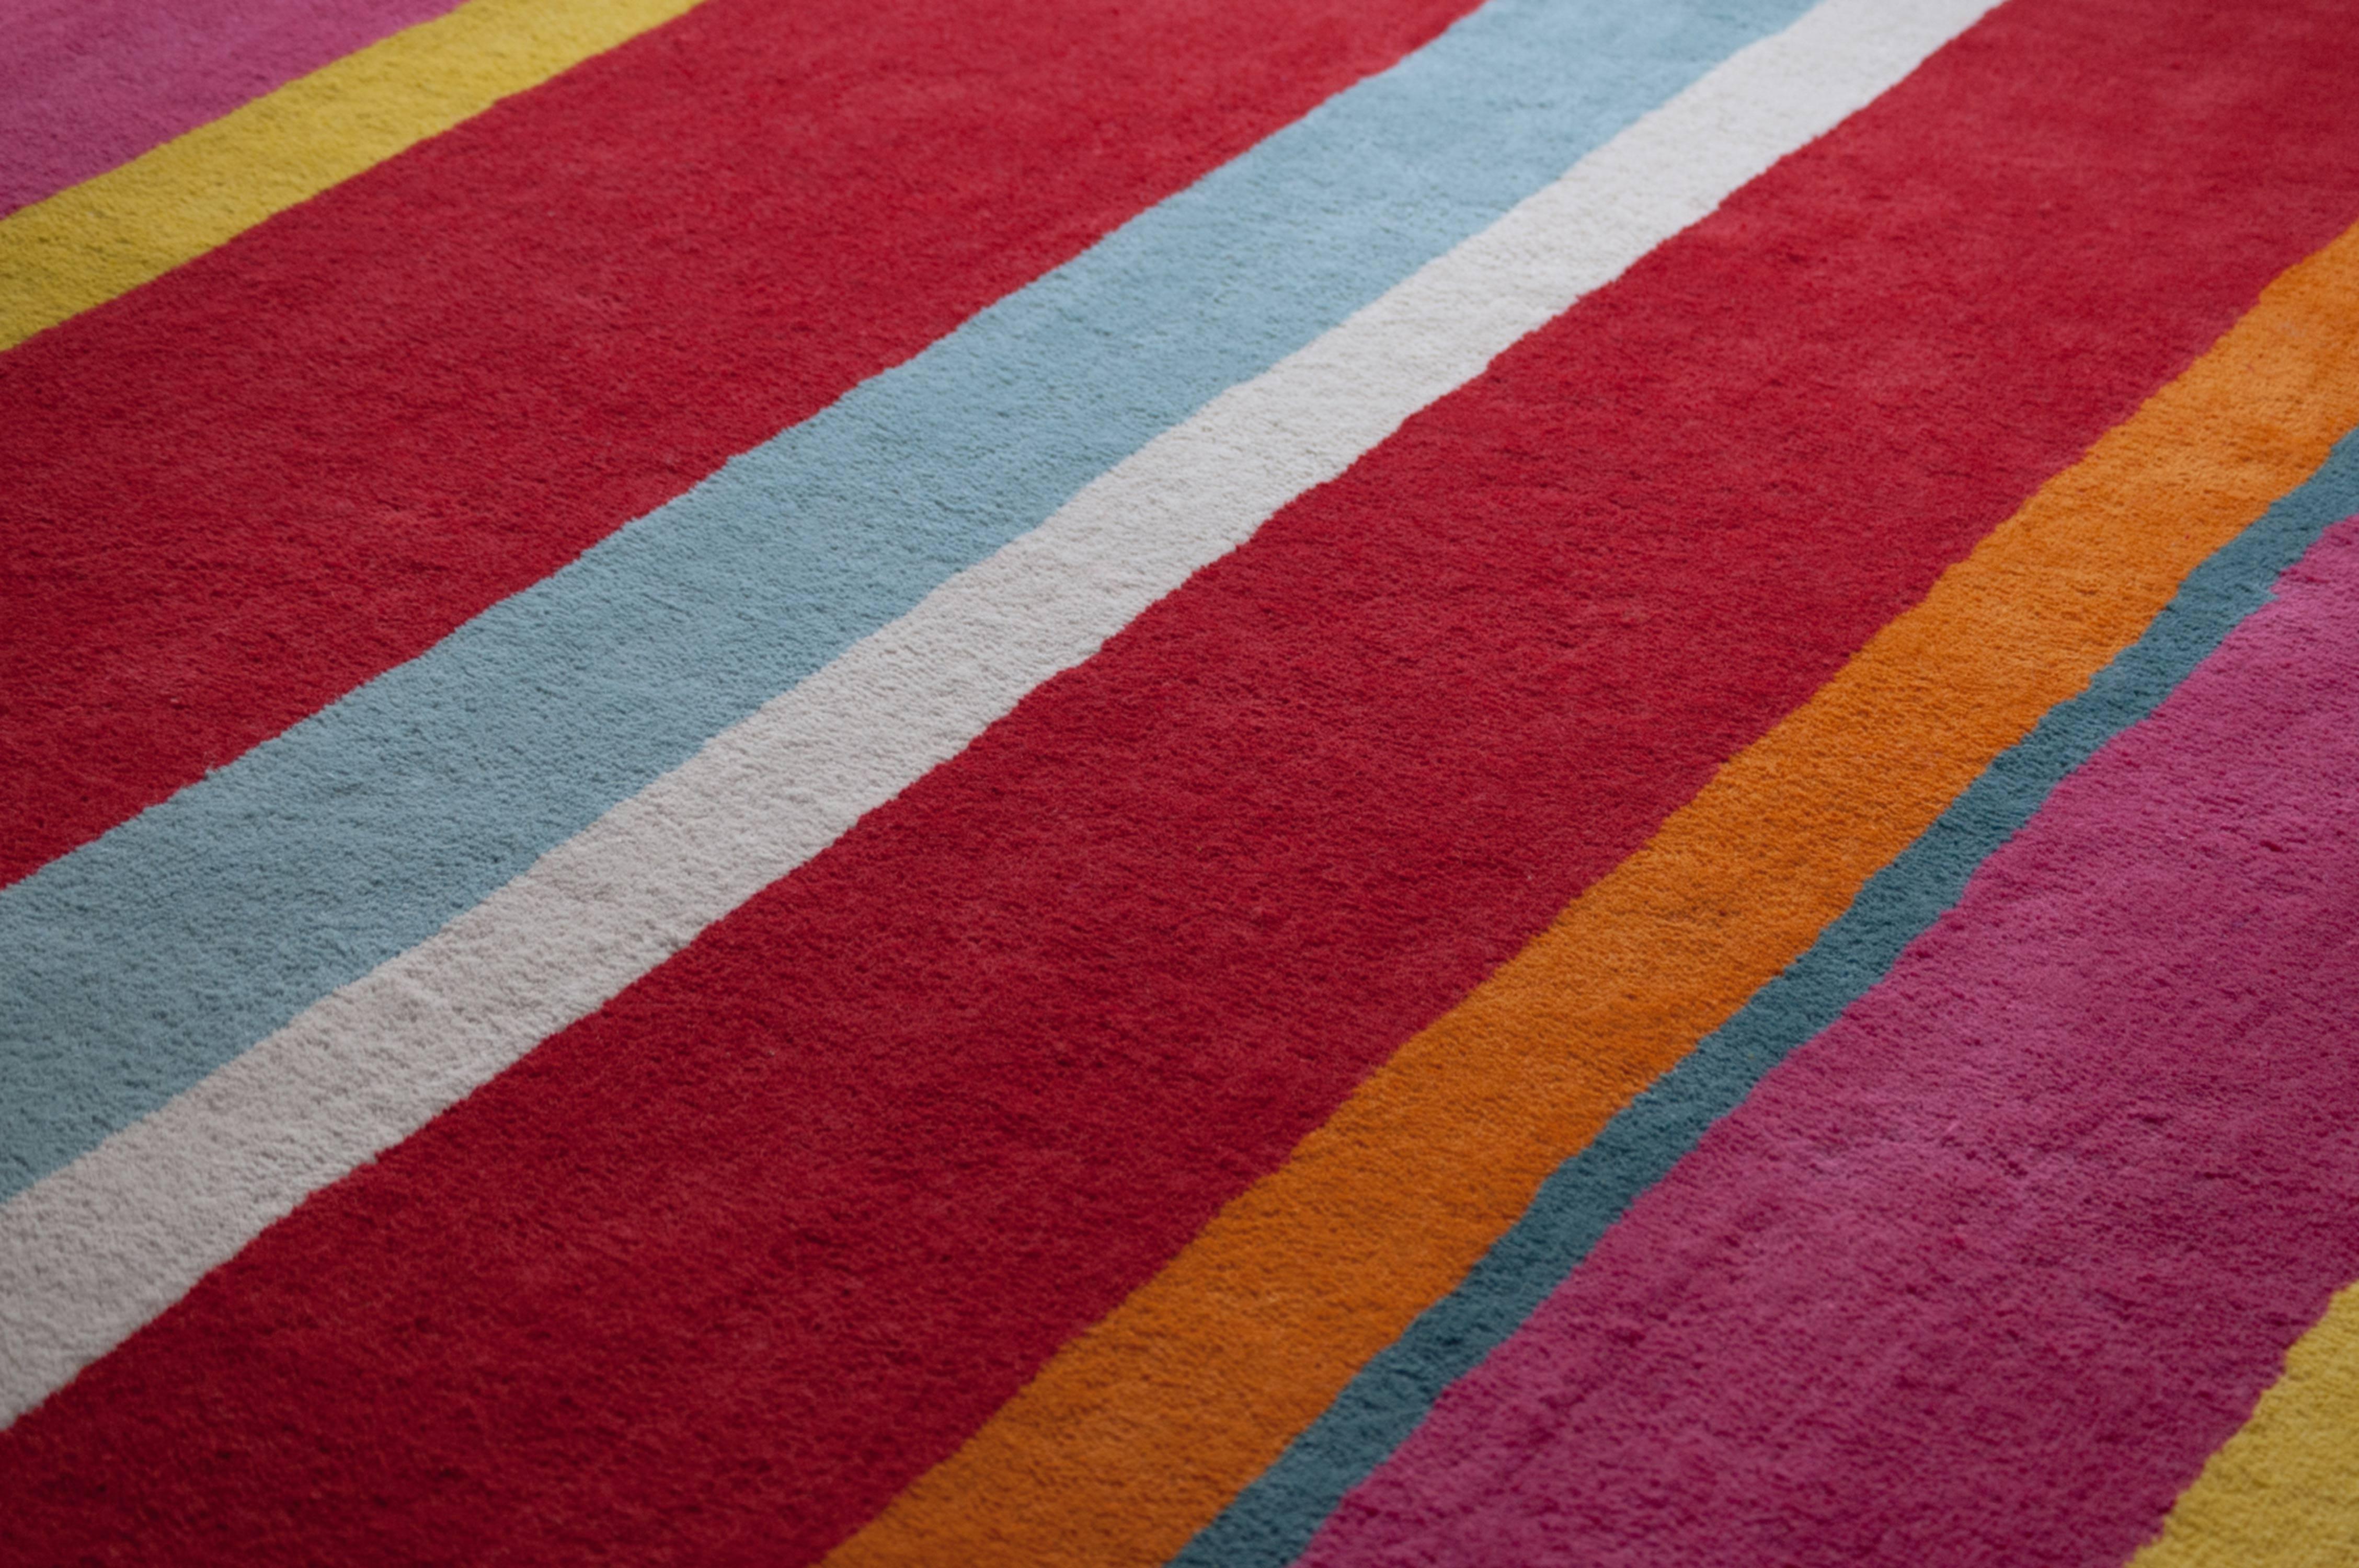 Colourfull Striped Carped